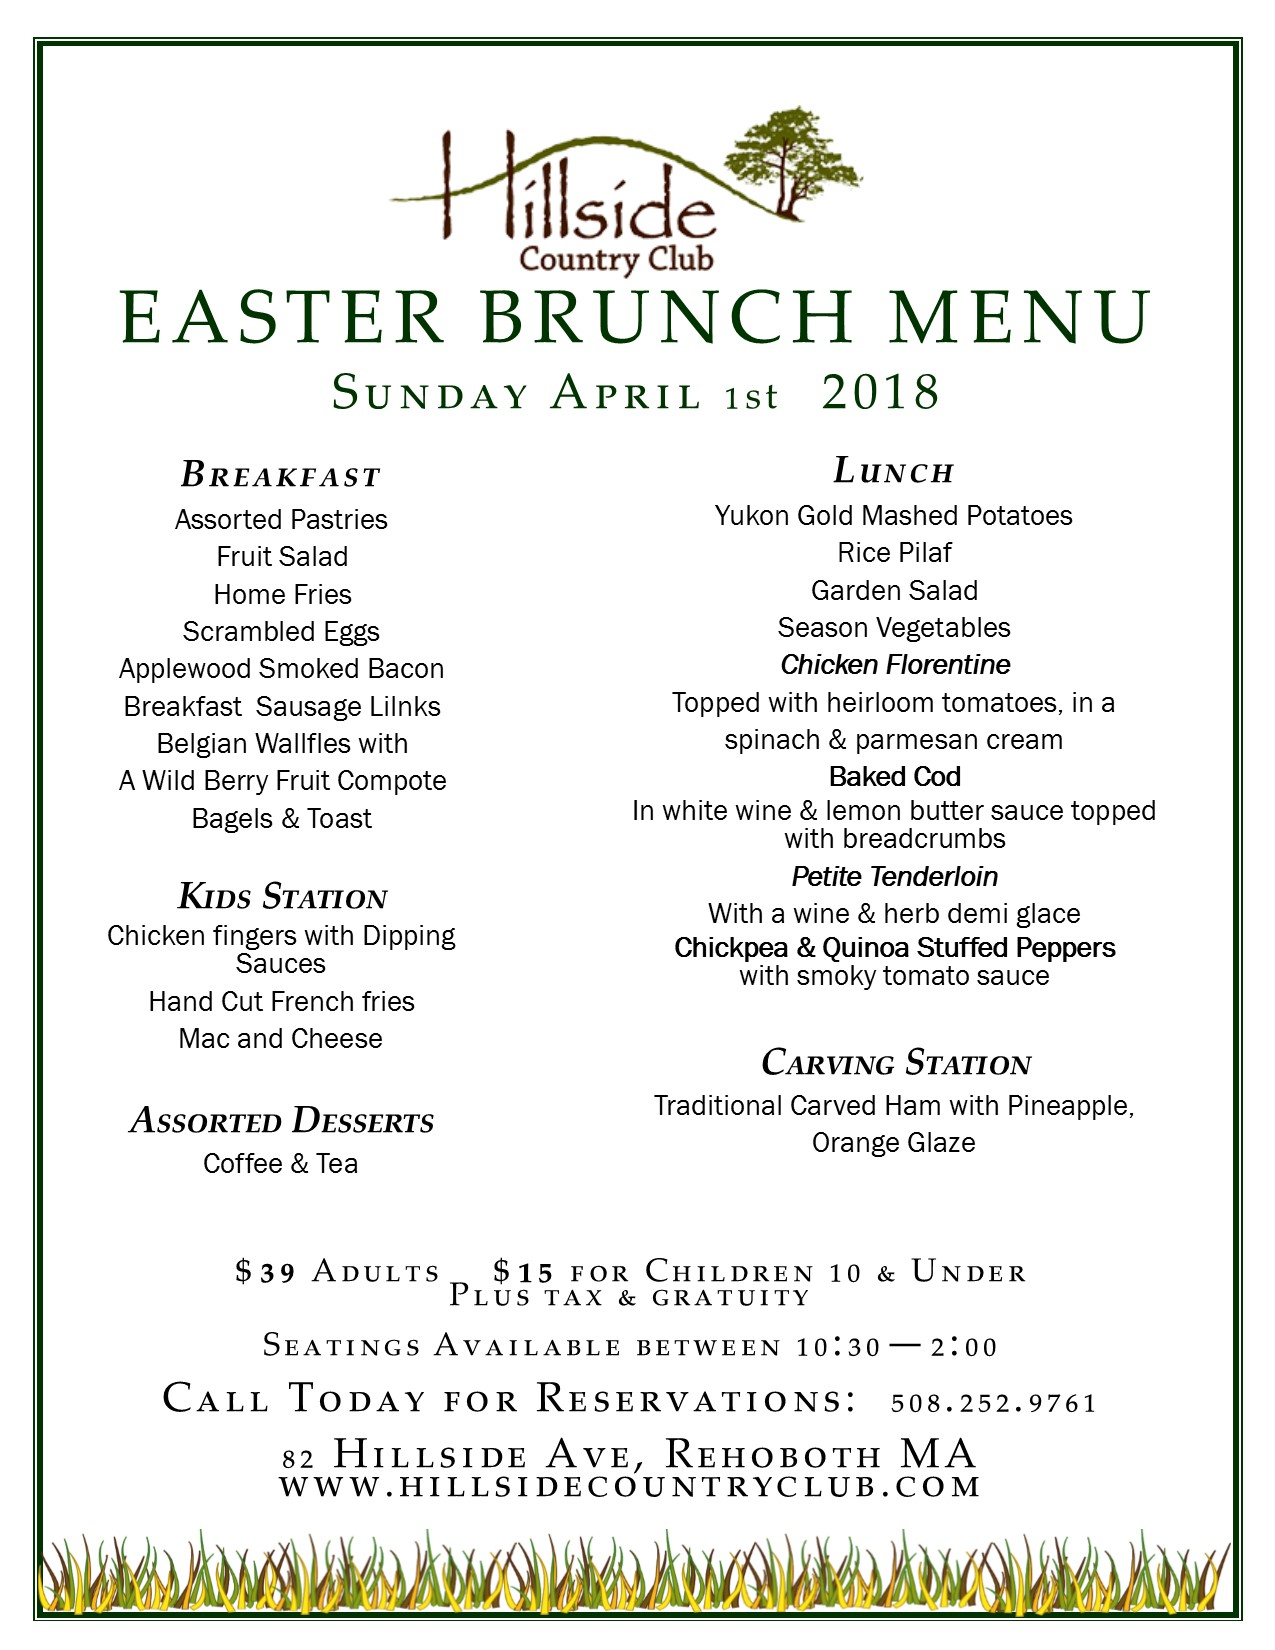 Hillside country club rehoboth ma for Easter brunch restaurant menus